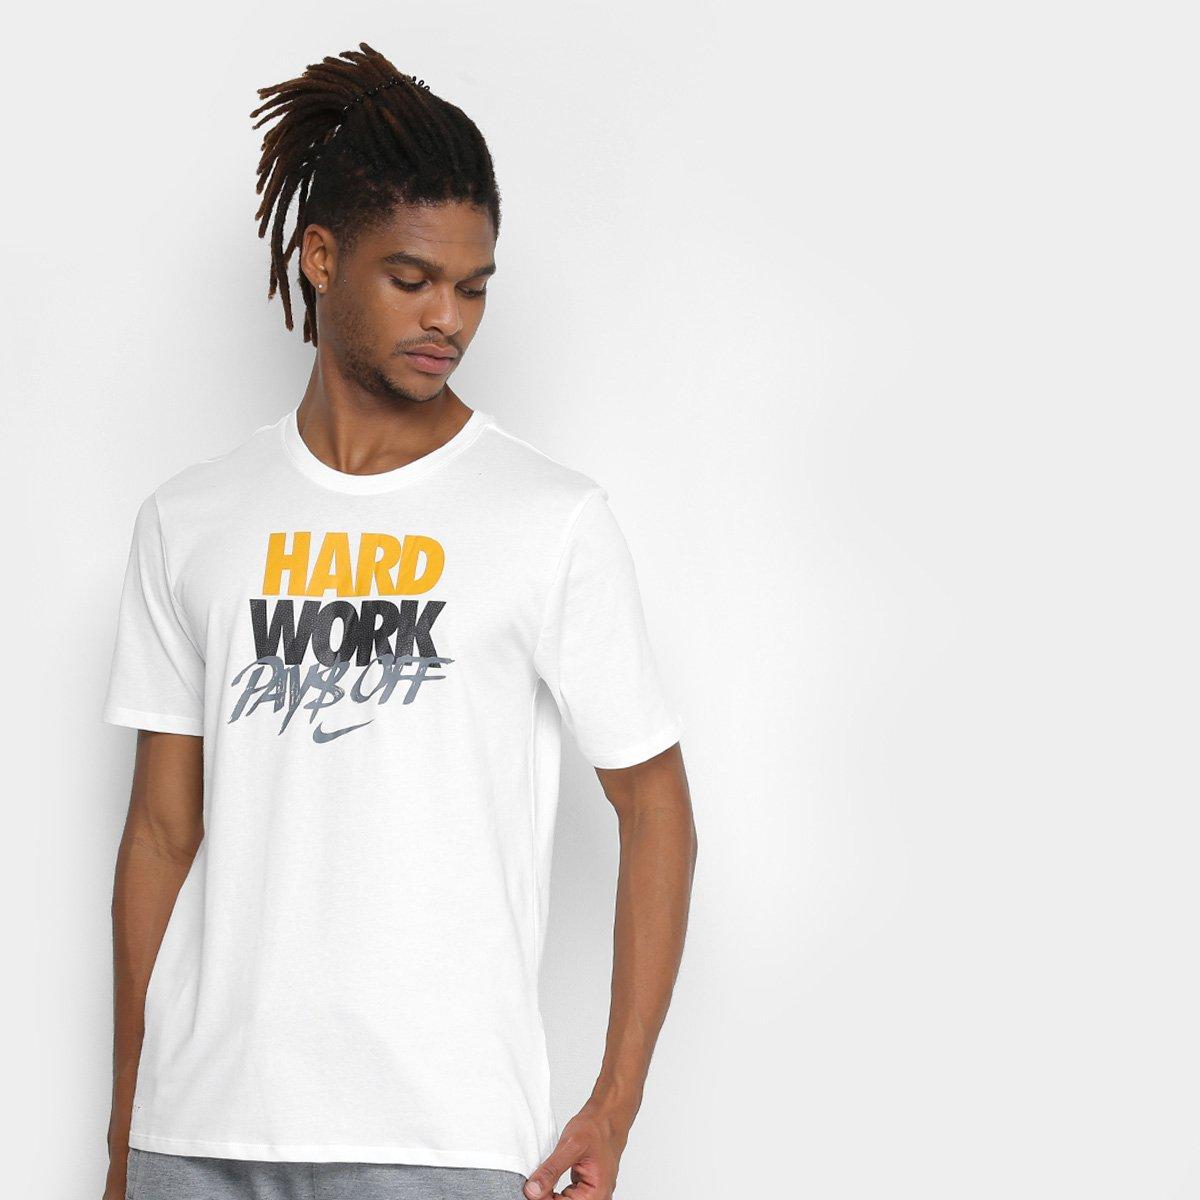 Camiseta Nike Hard Work Masculina - Branco - Compre Agora  7d27dff8bda71